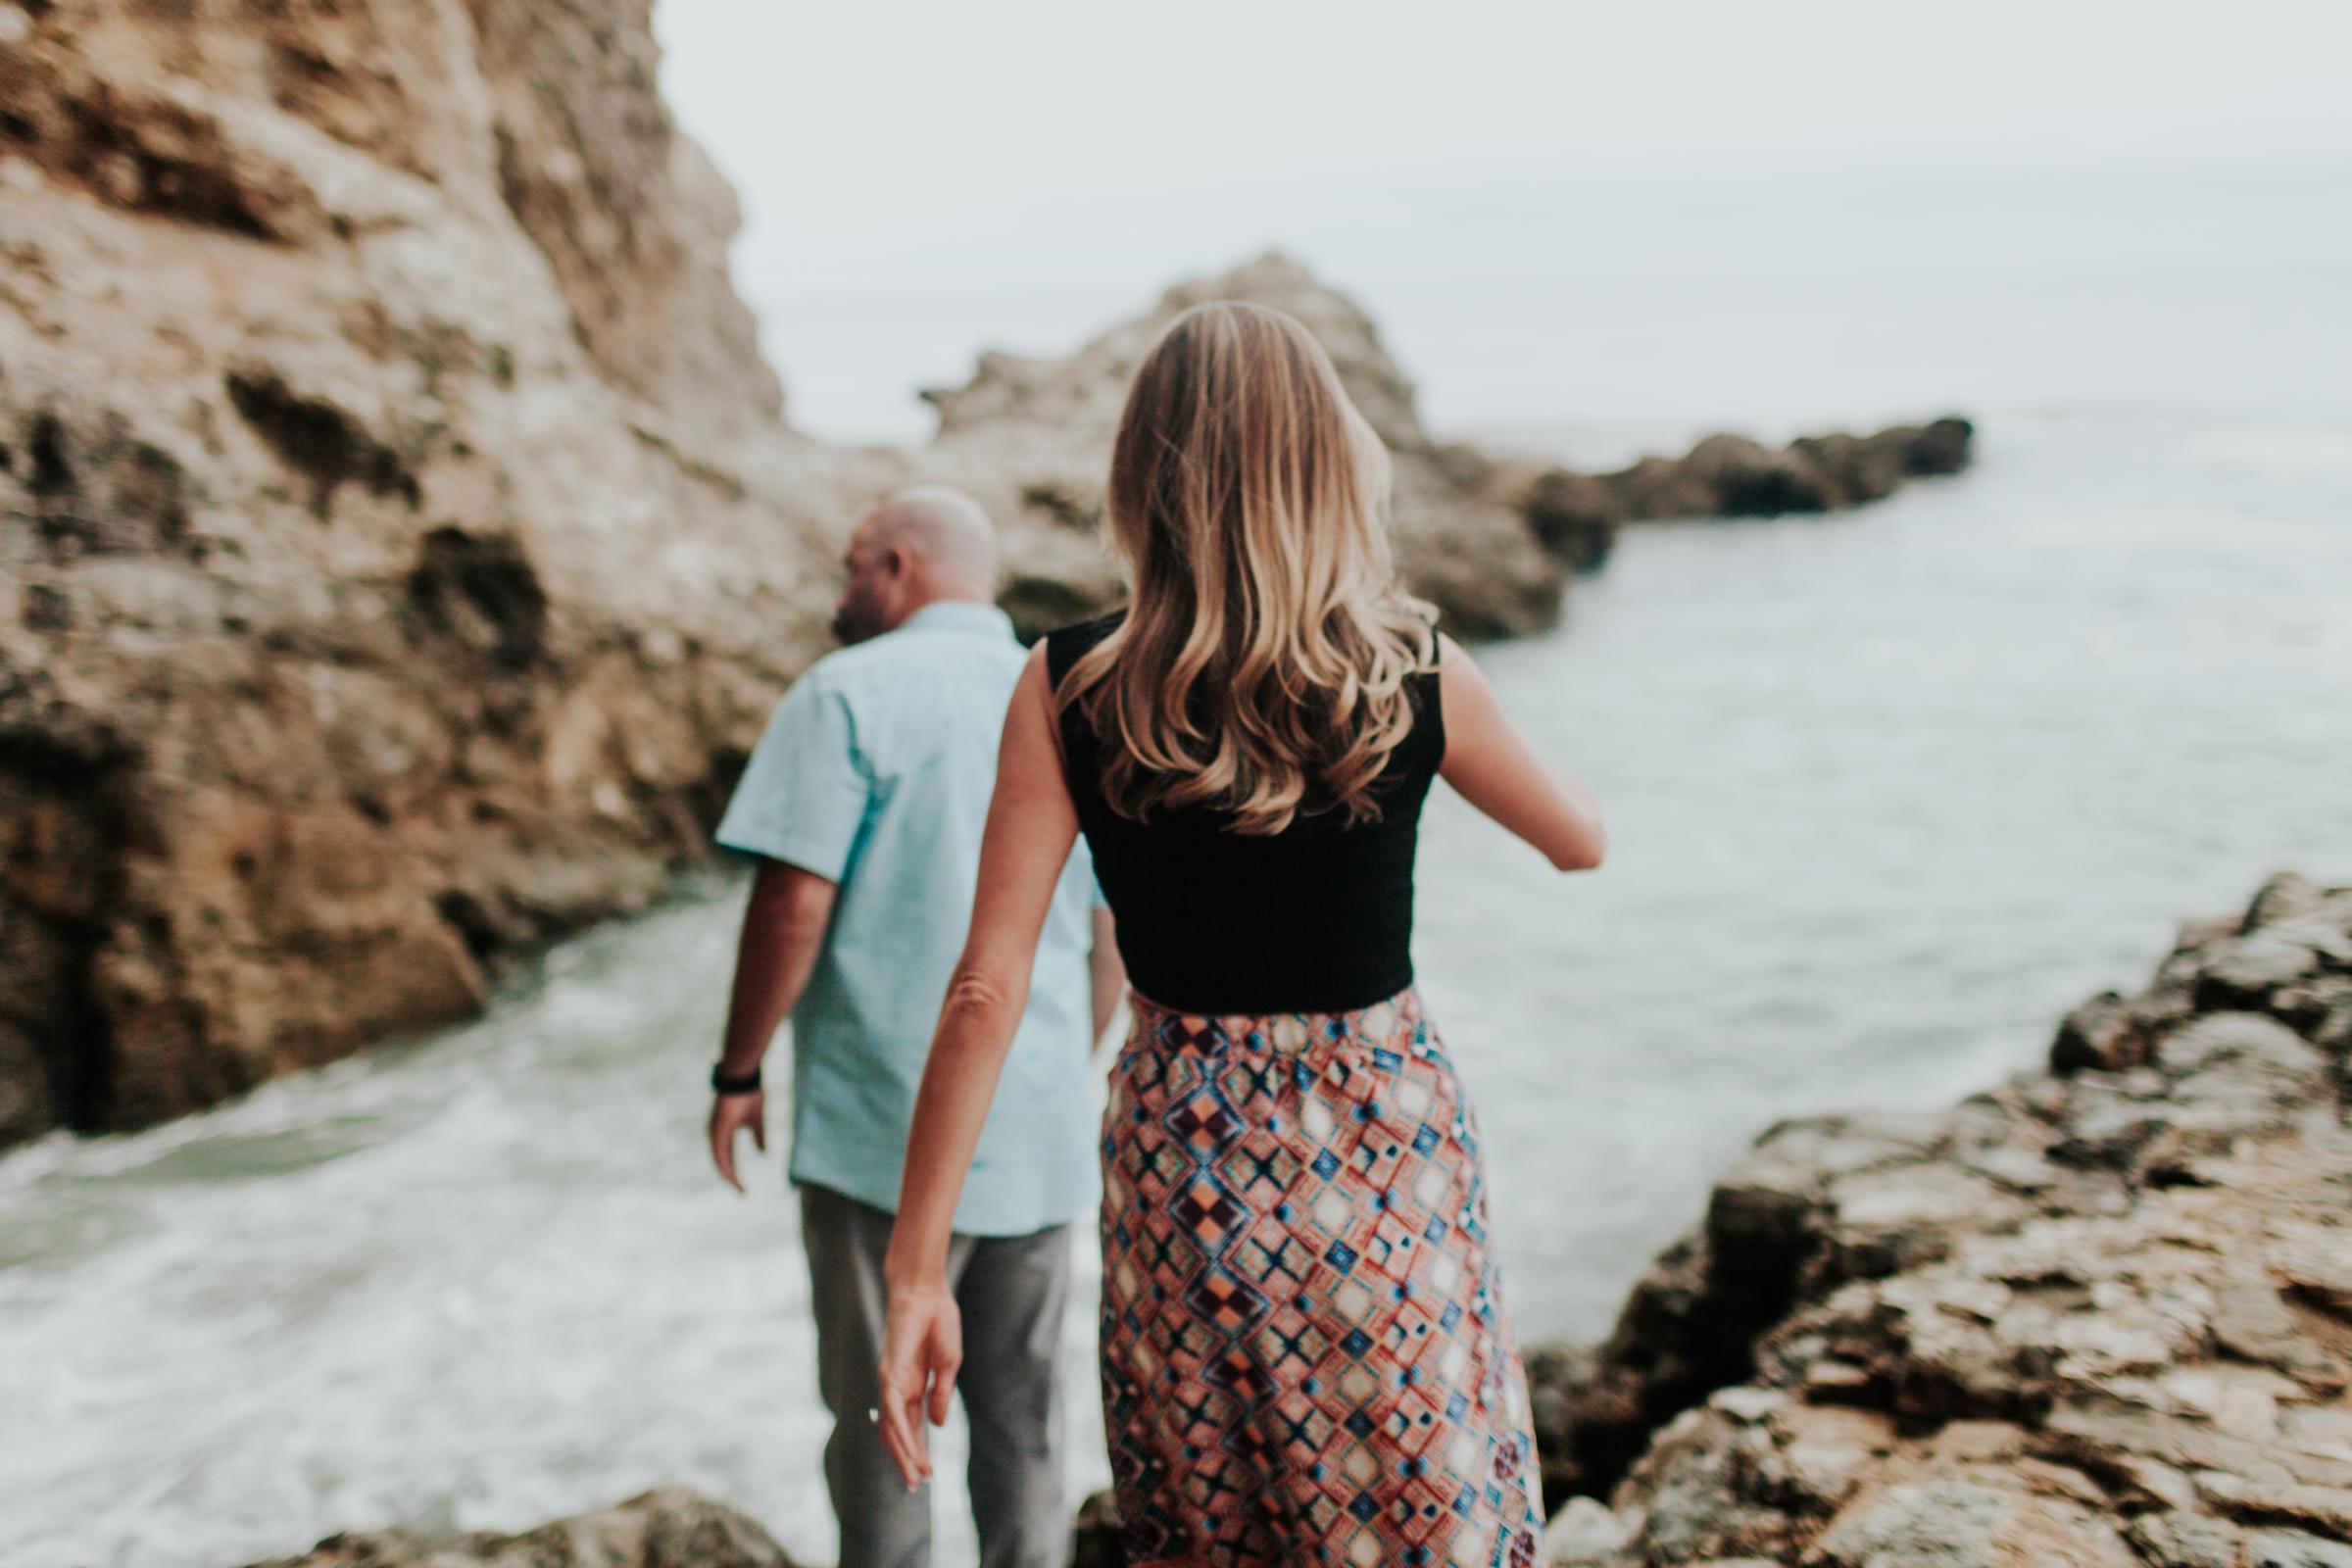 terranea-resort-palos-verdes-california-wedding-photography-cove-los-angeles-pierce-108.jpg